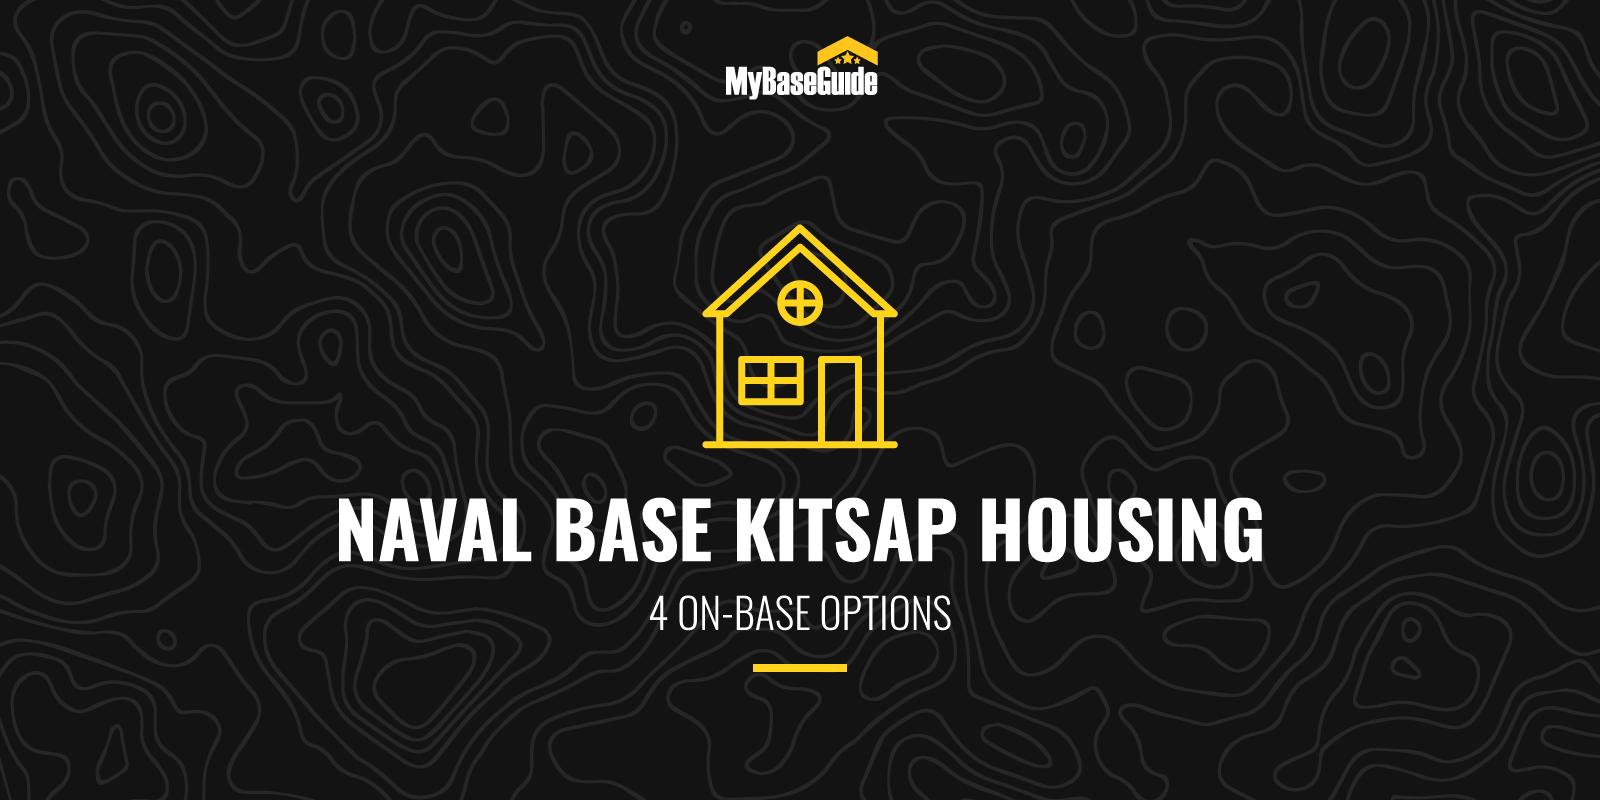 Naval Base Kitsap Housing: 4 On-Base Options